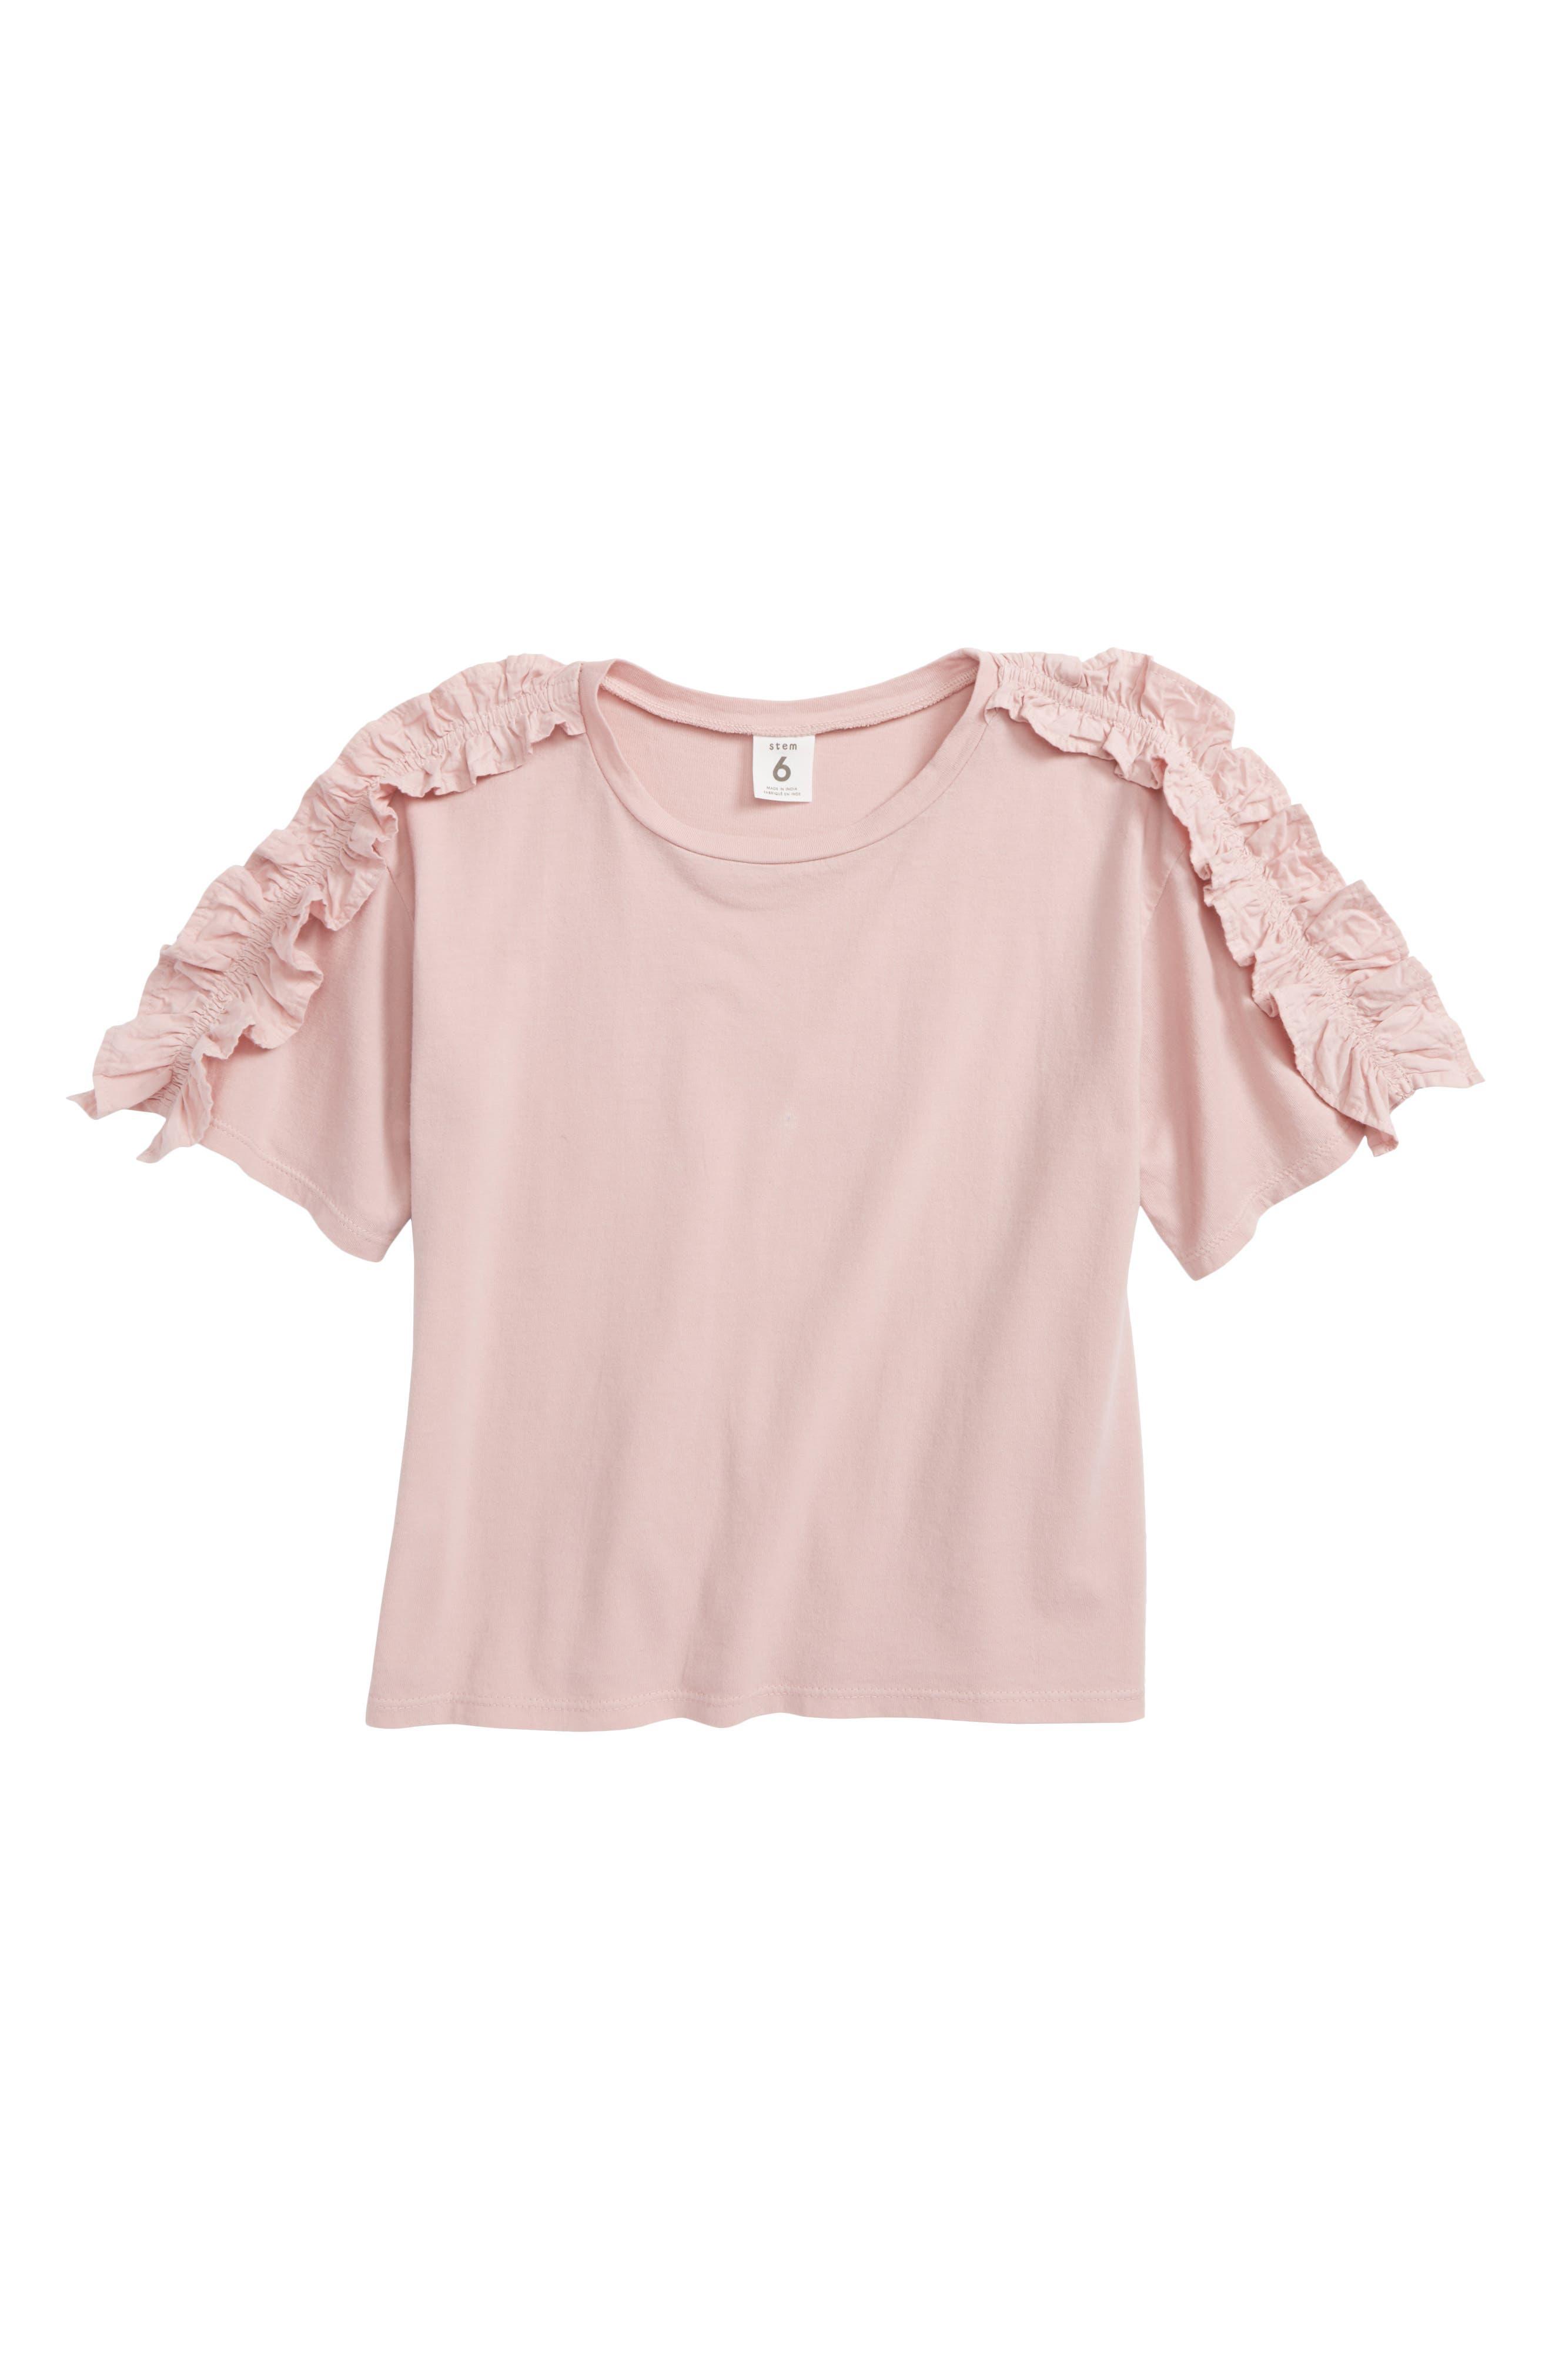 Ruffle Sleeve Tee,                             Main thumbnail 1, color,                             Pink Apricot